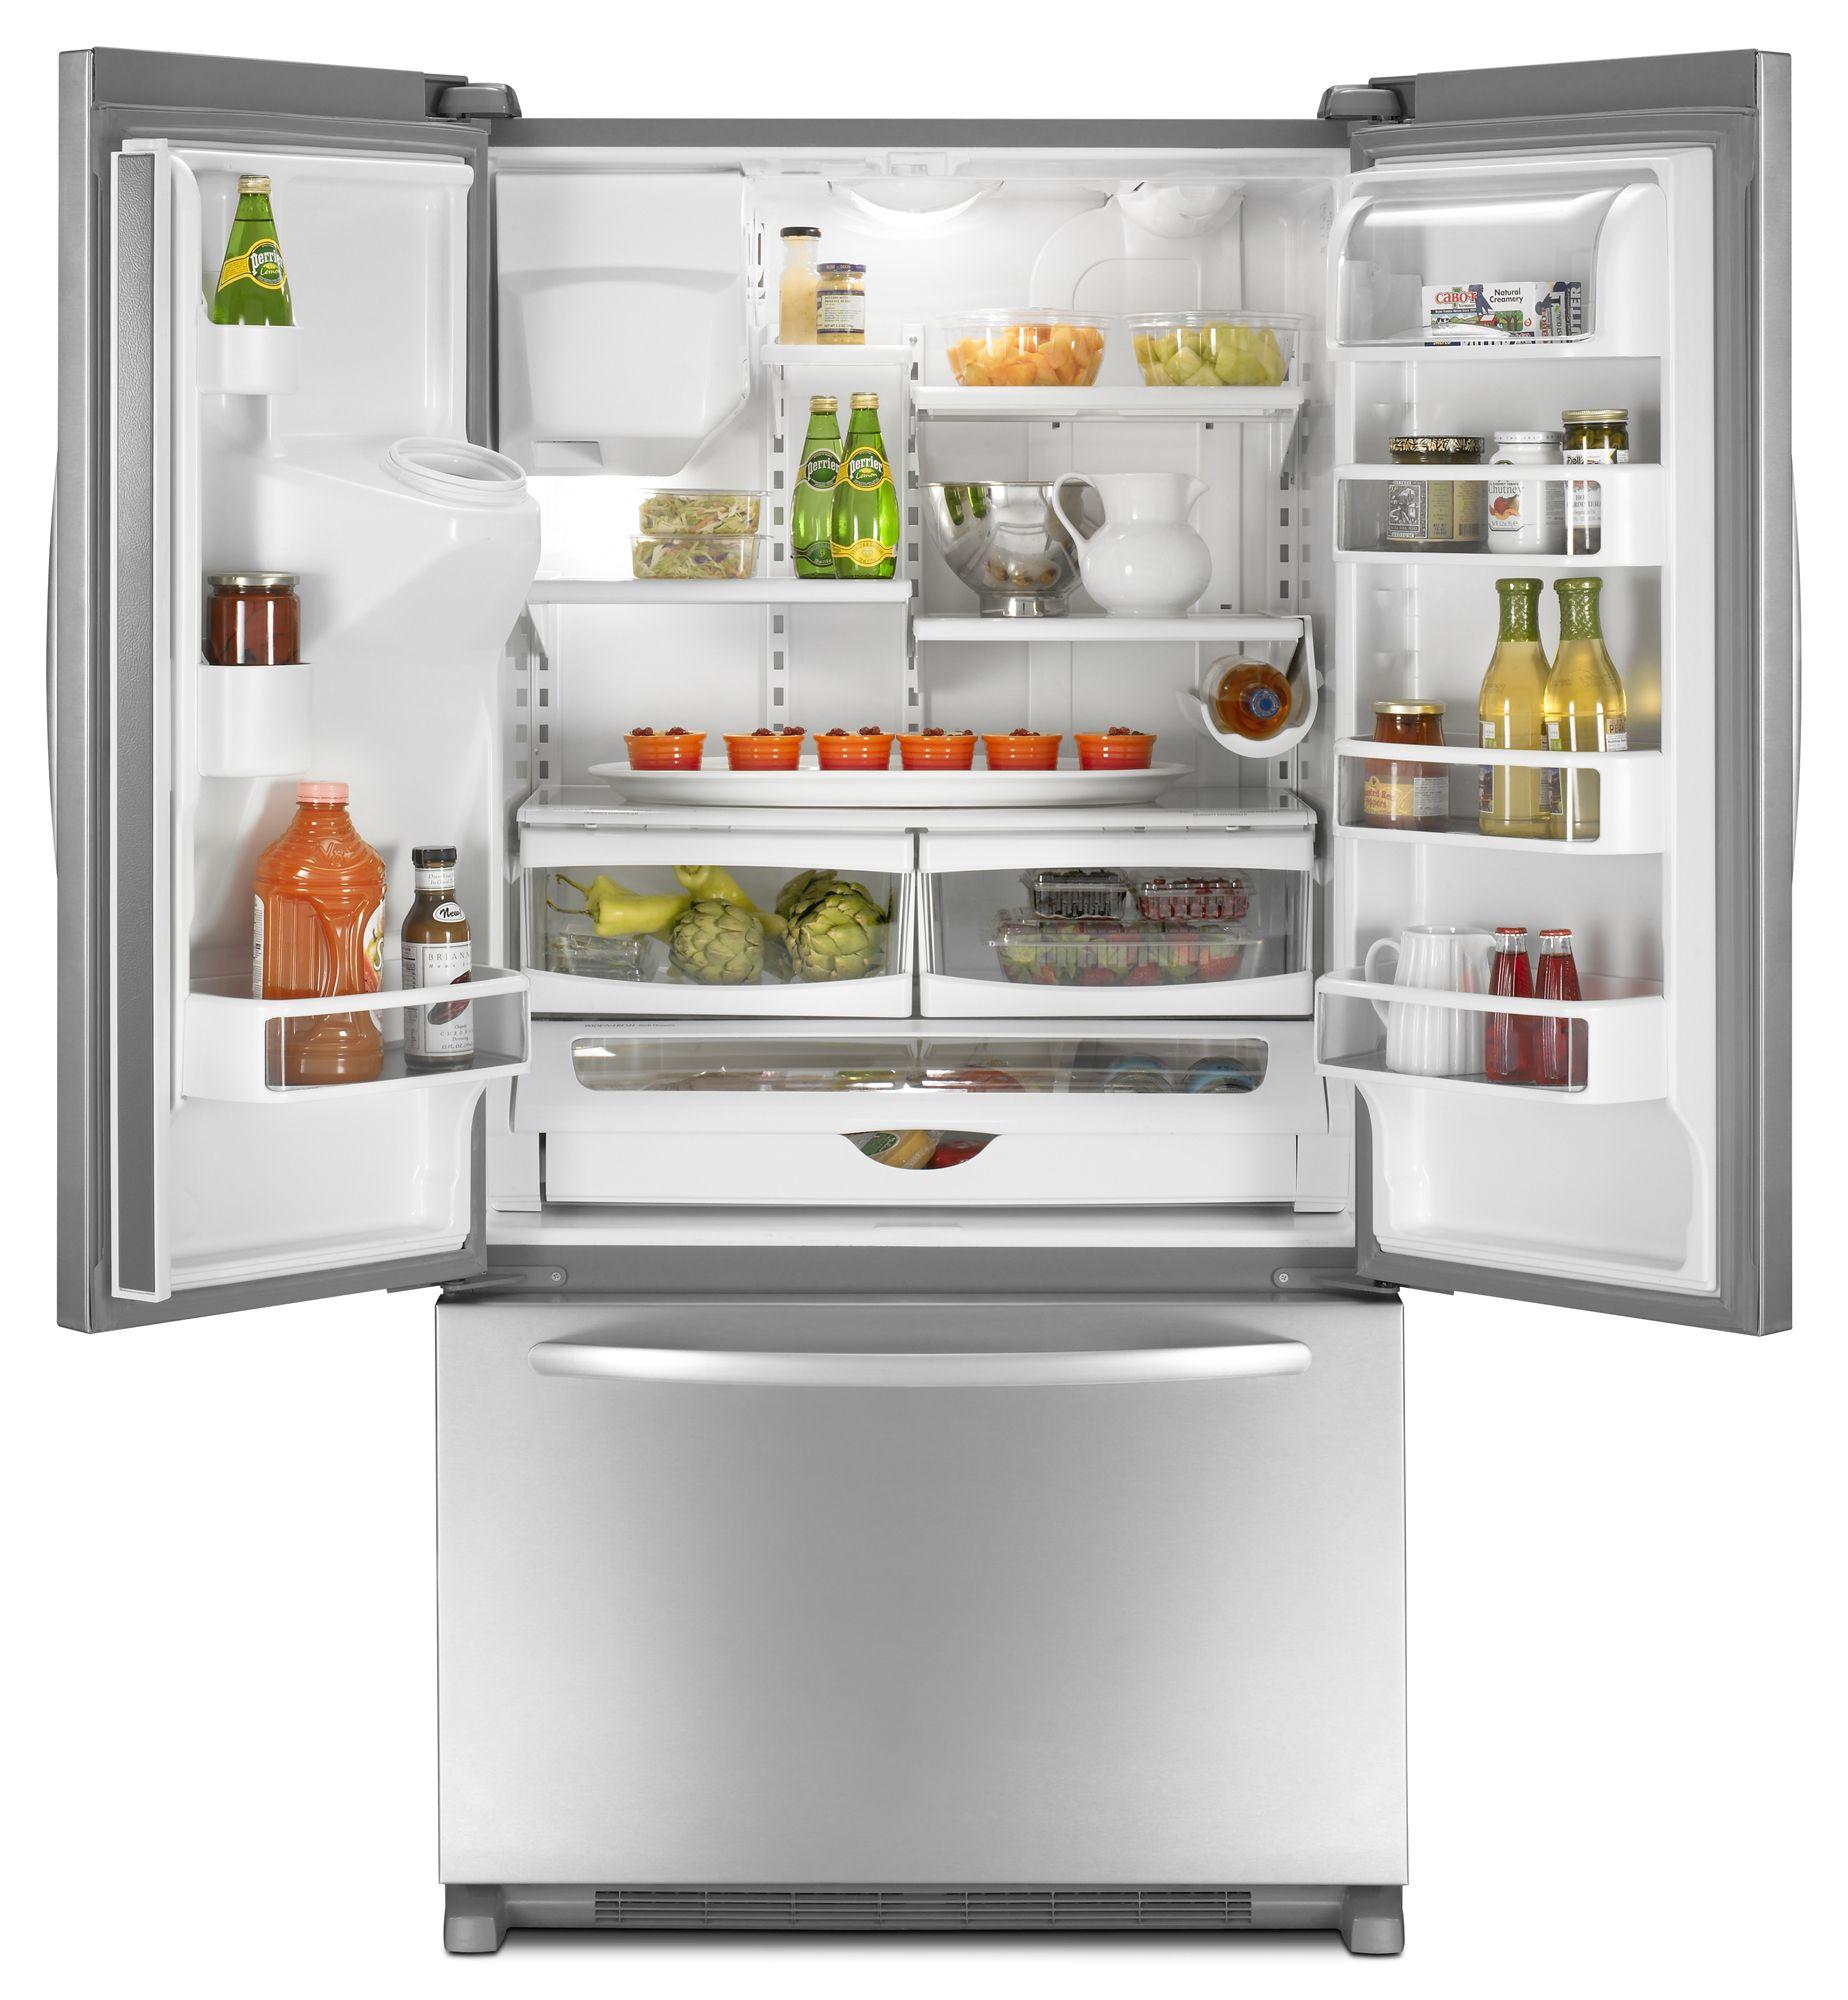 KitchenAid 24.9 cu. ft. Series II French-Door Refrigerator